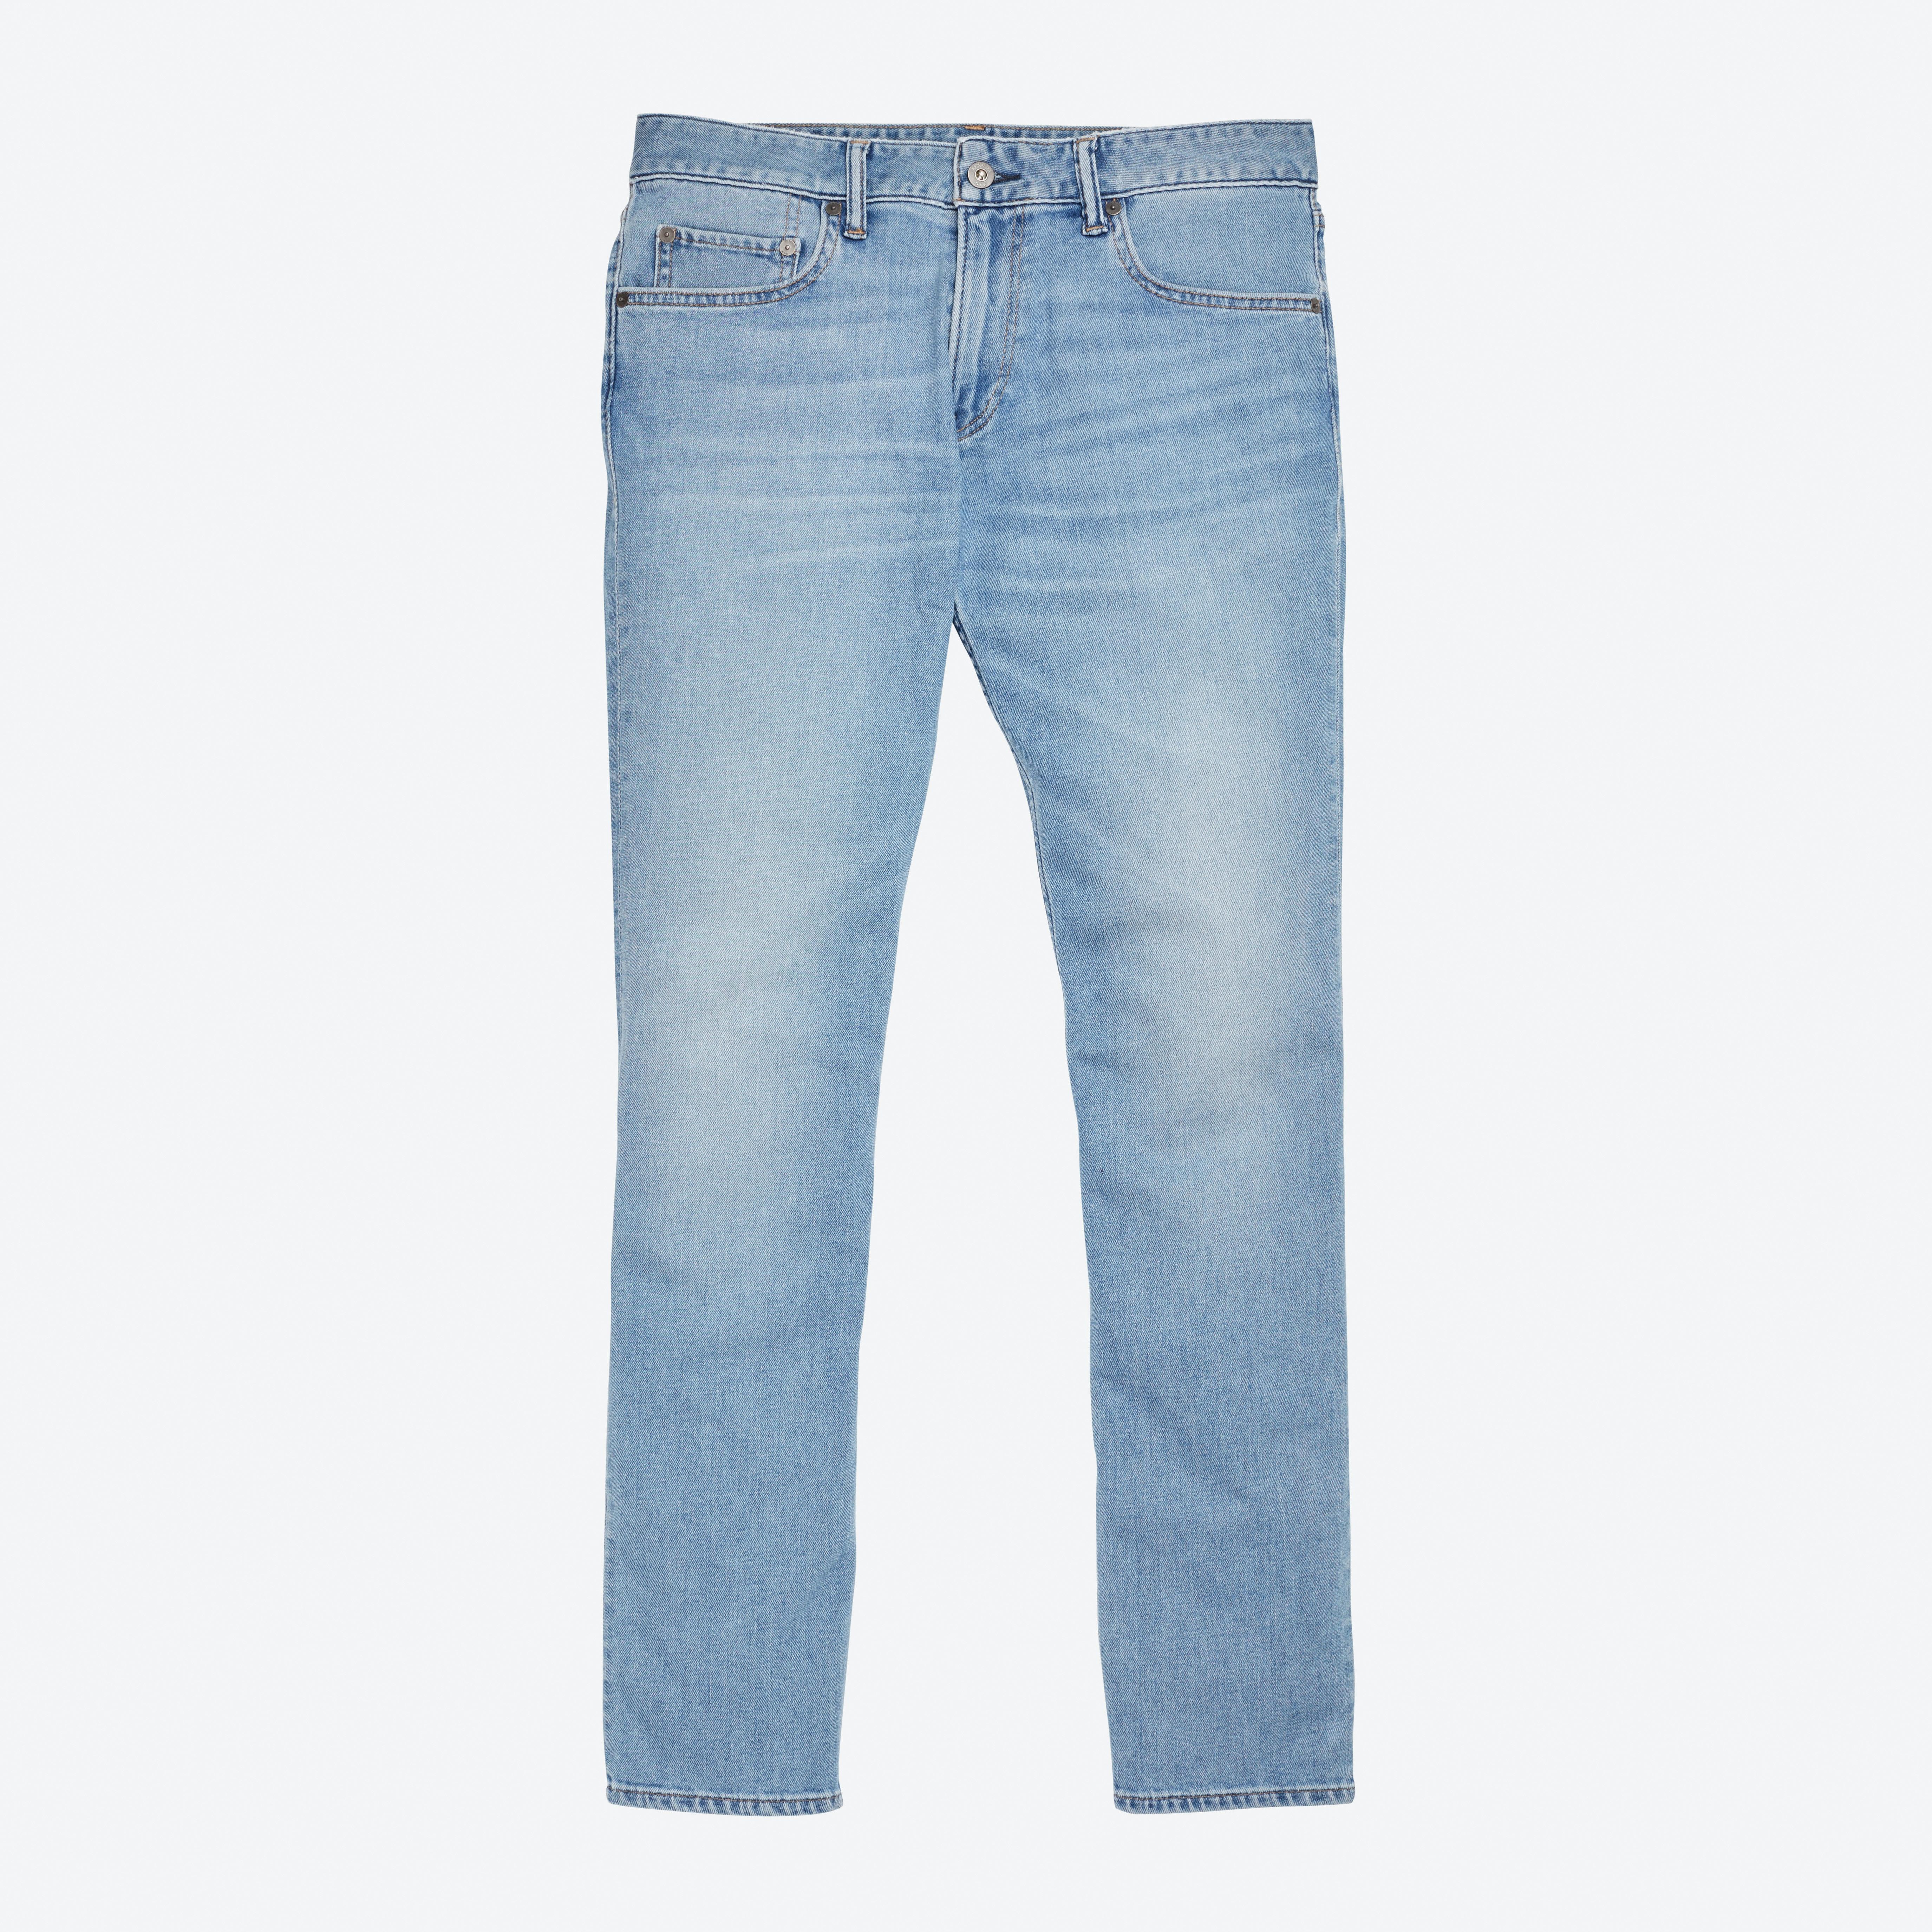 Summer Weight Jeans